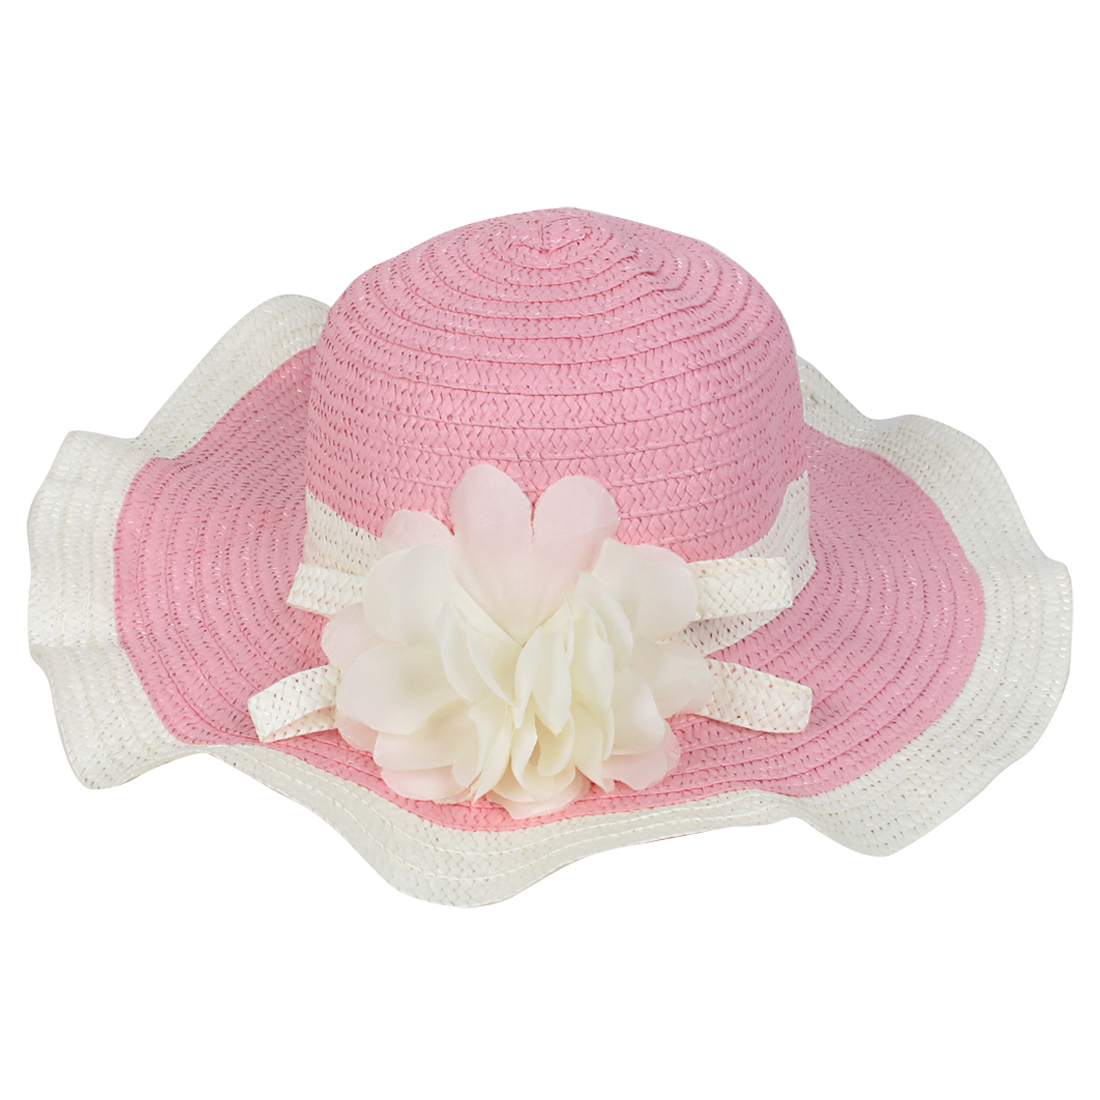 Beige Pink Wide Brim Flower Beach Sun Cap Hat for Woman